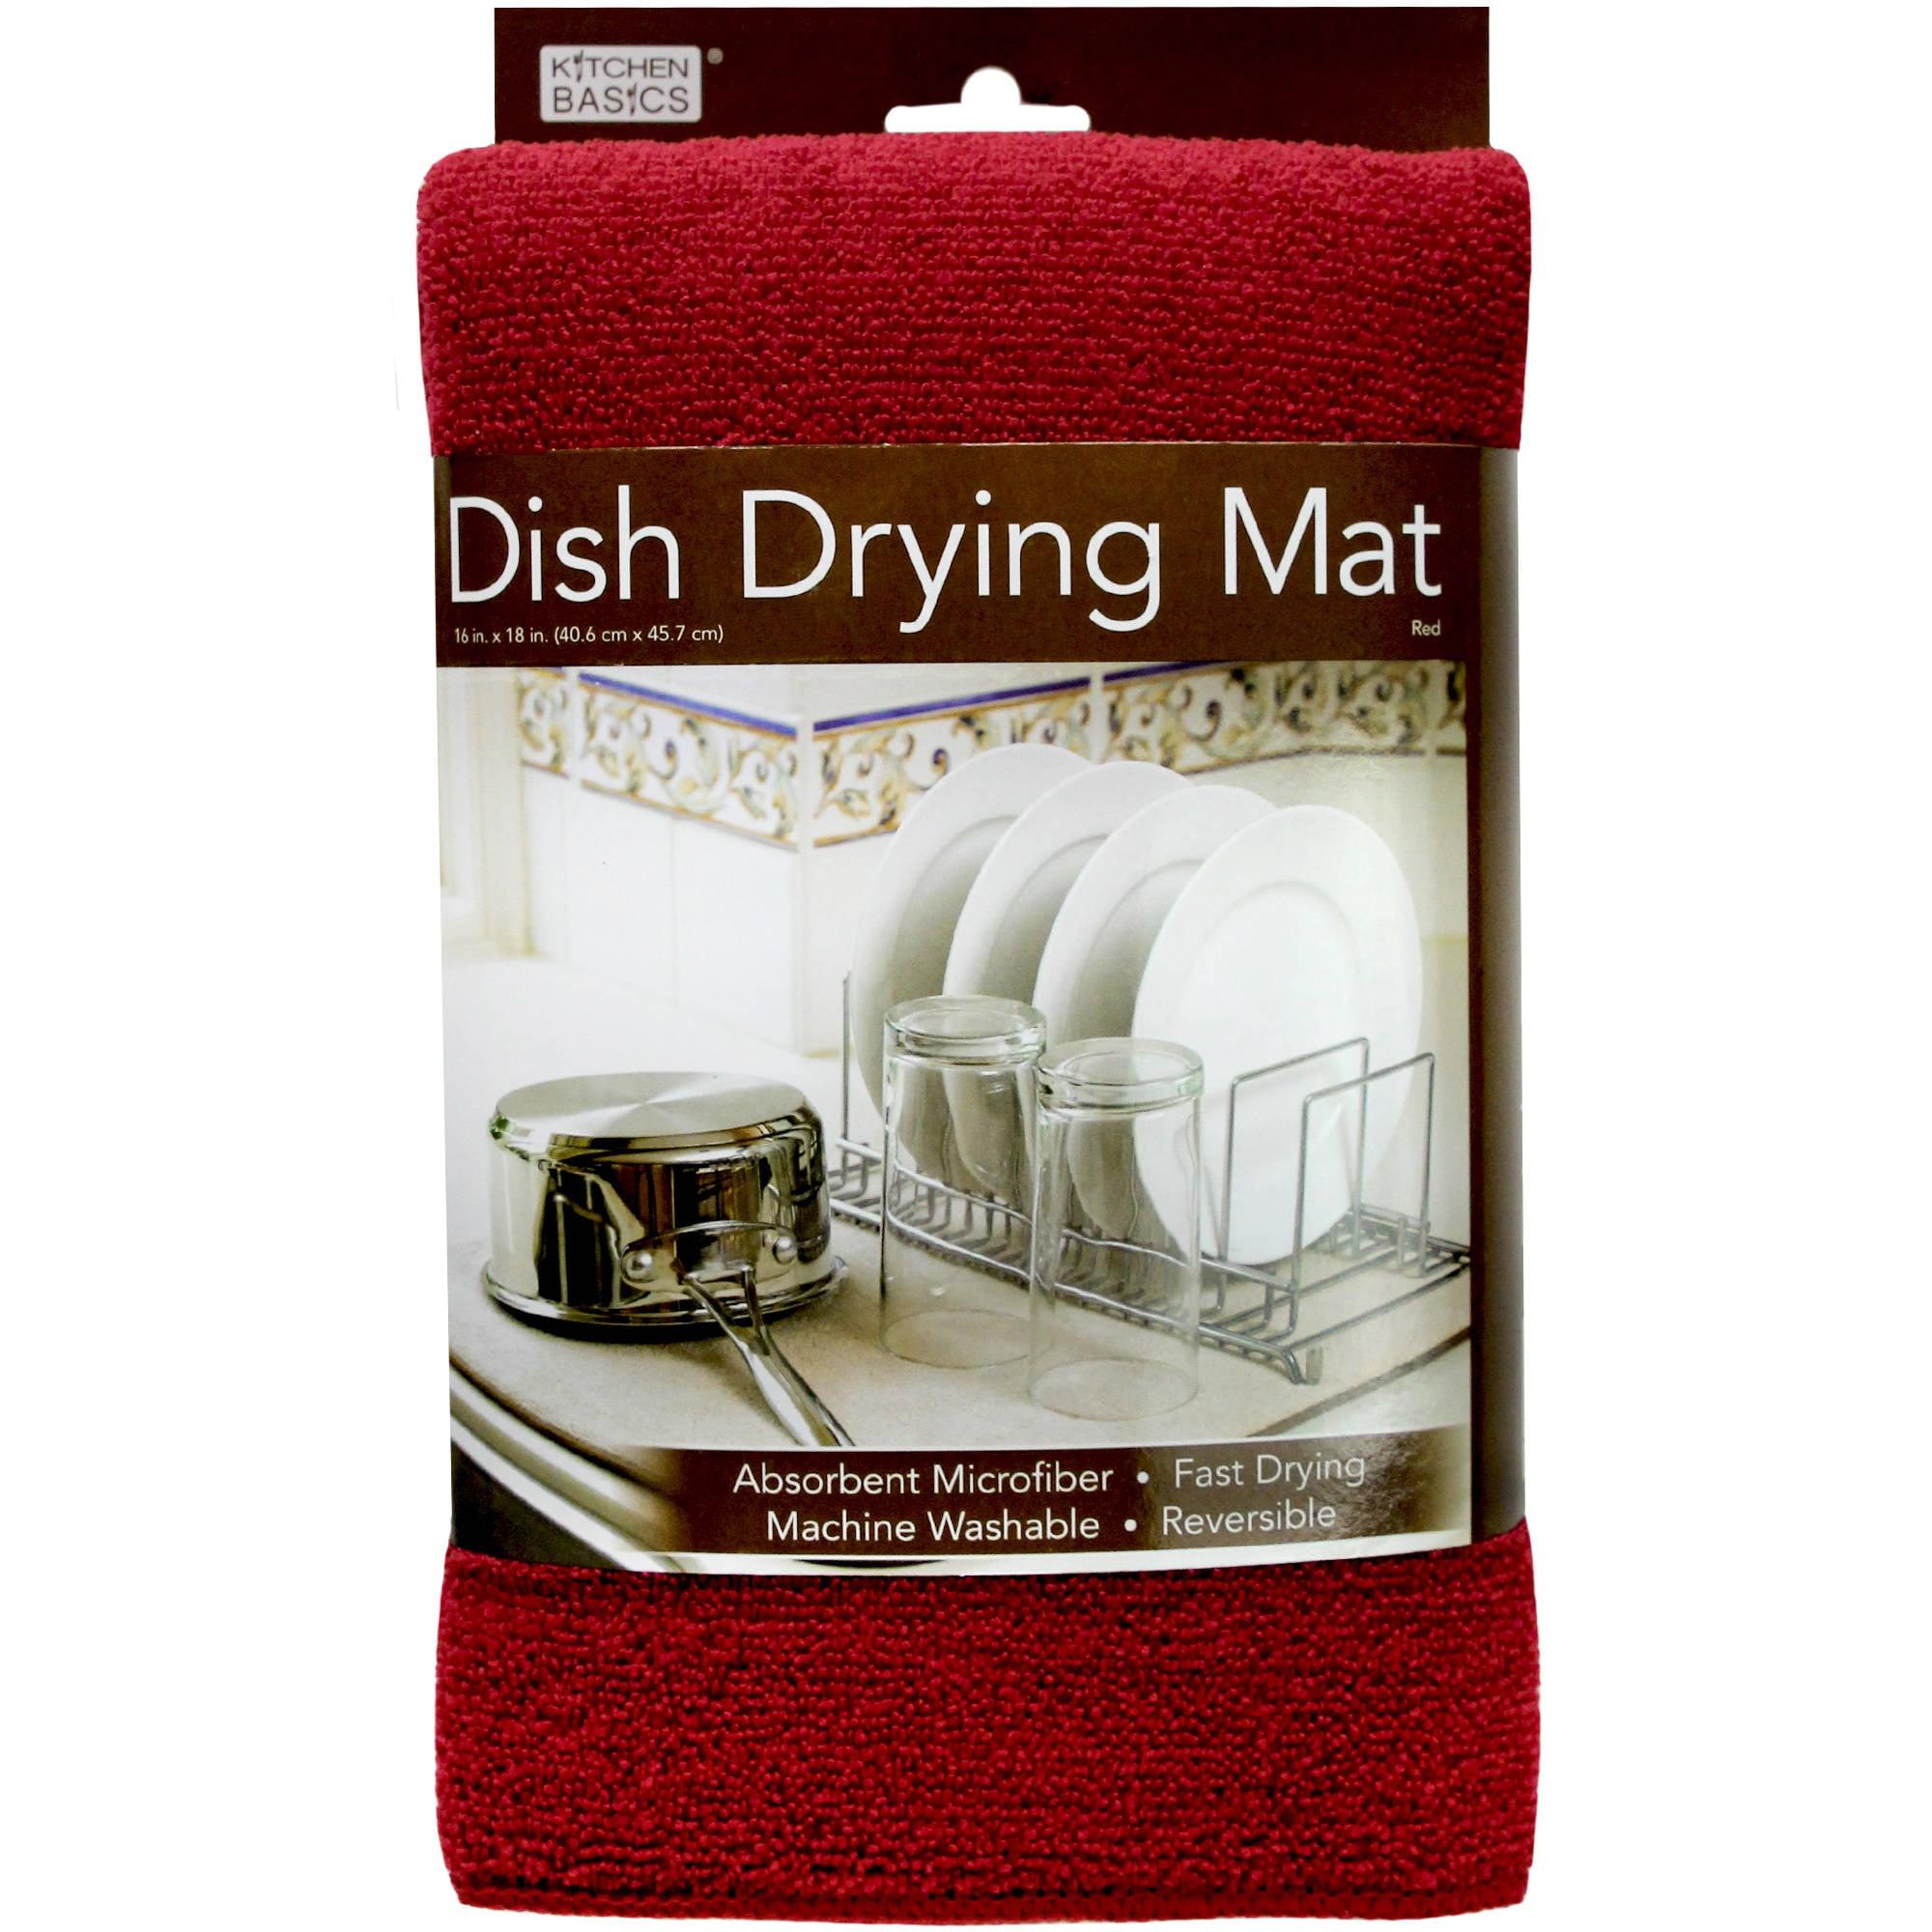 Kitchen Basics Reversible Microfiber Dish Drying Mat Red